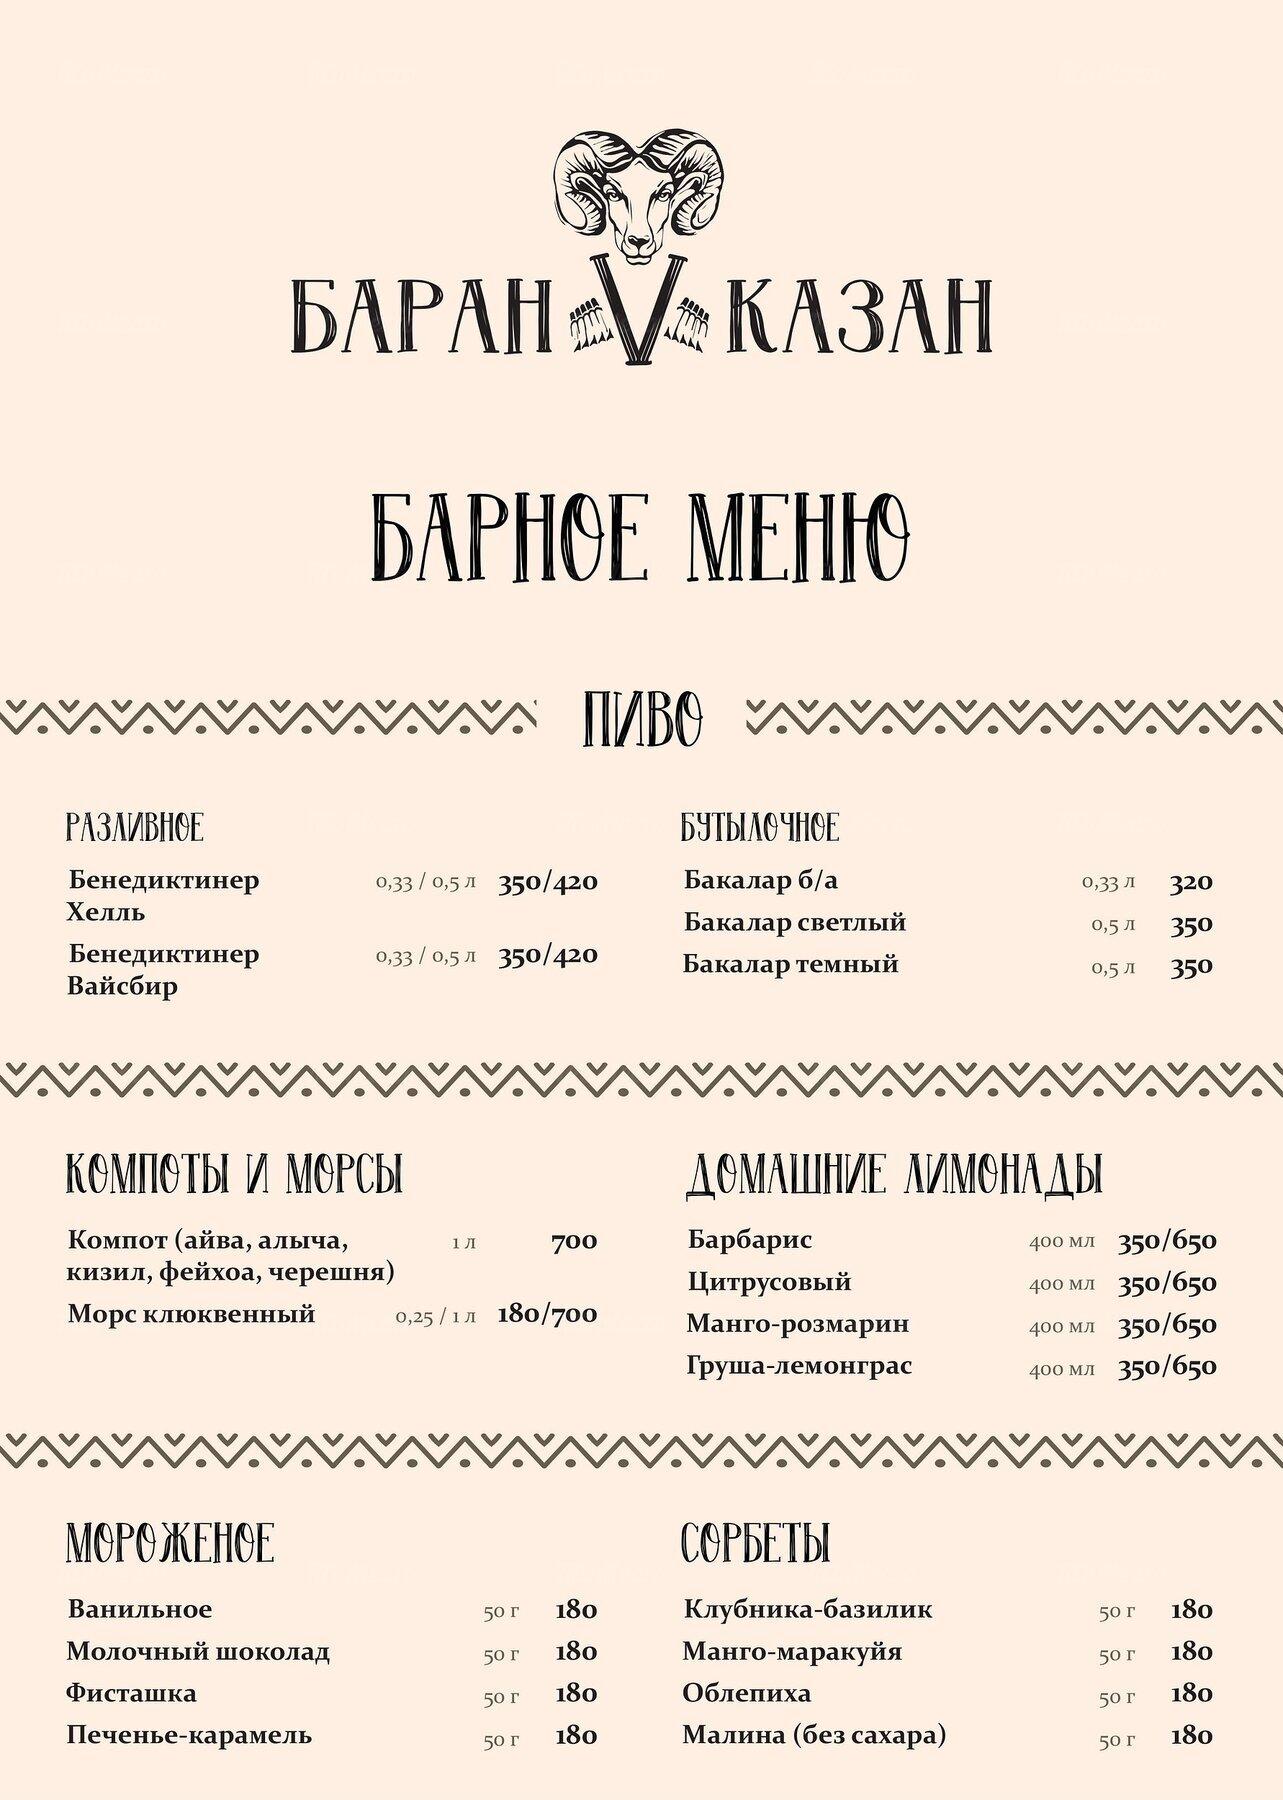 Меню ресторана Баран в Казан на Марксистской фото 3